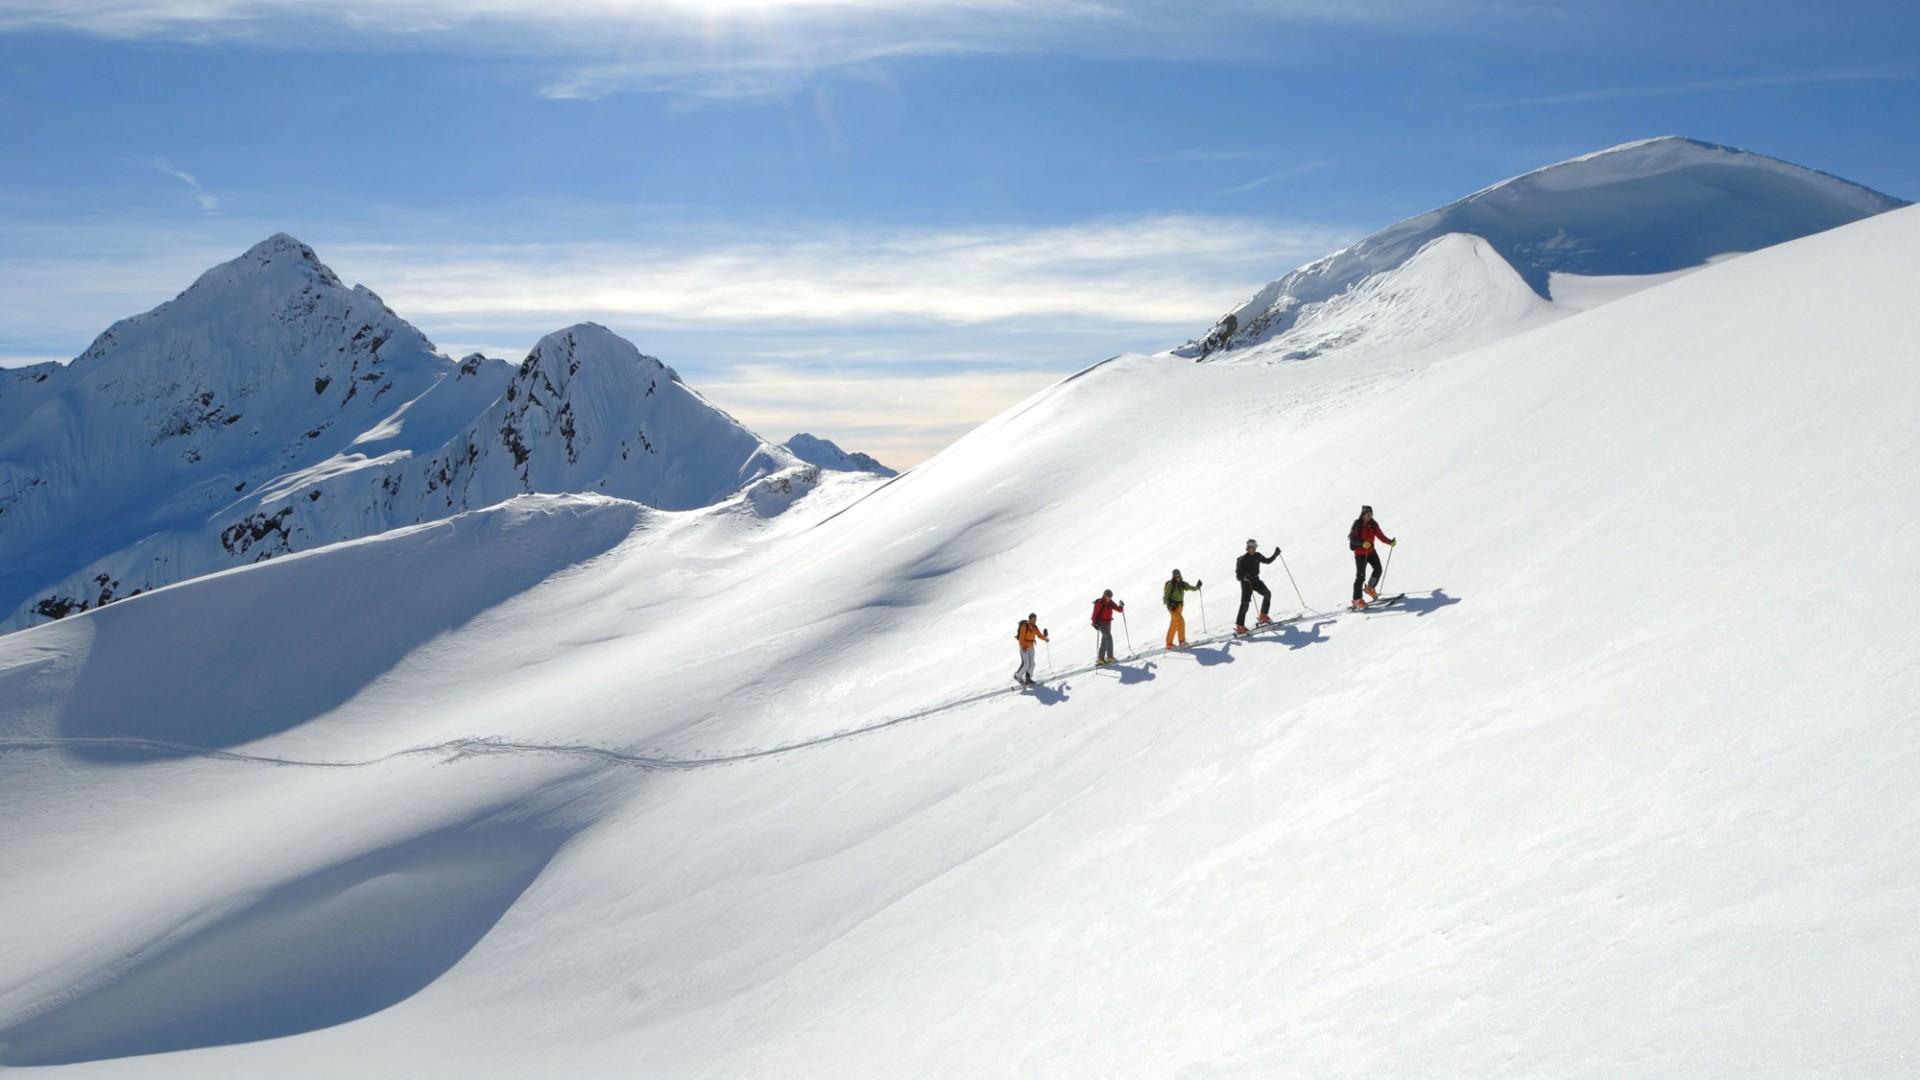 5 Personen beim Skitourengehen am Arlberg.